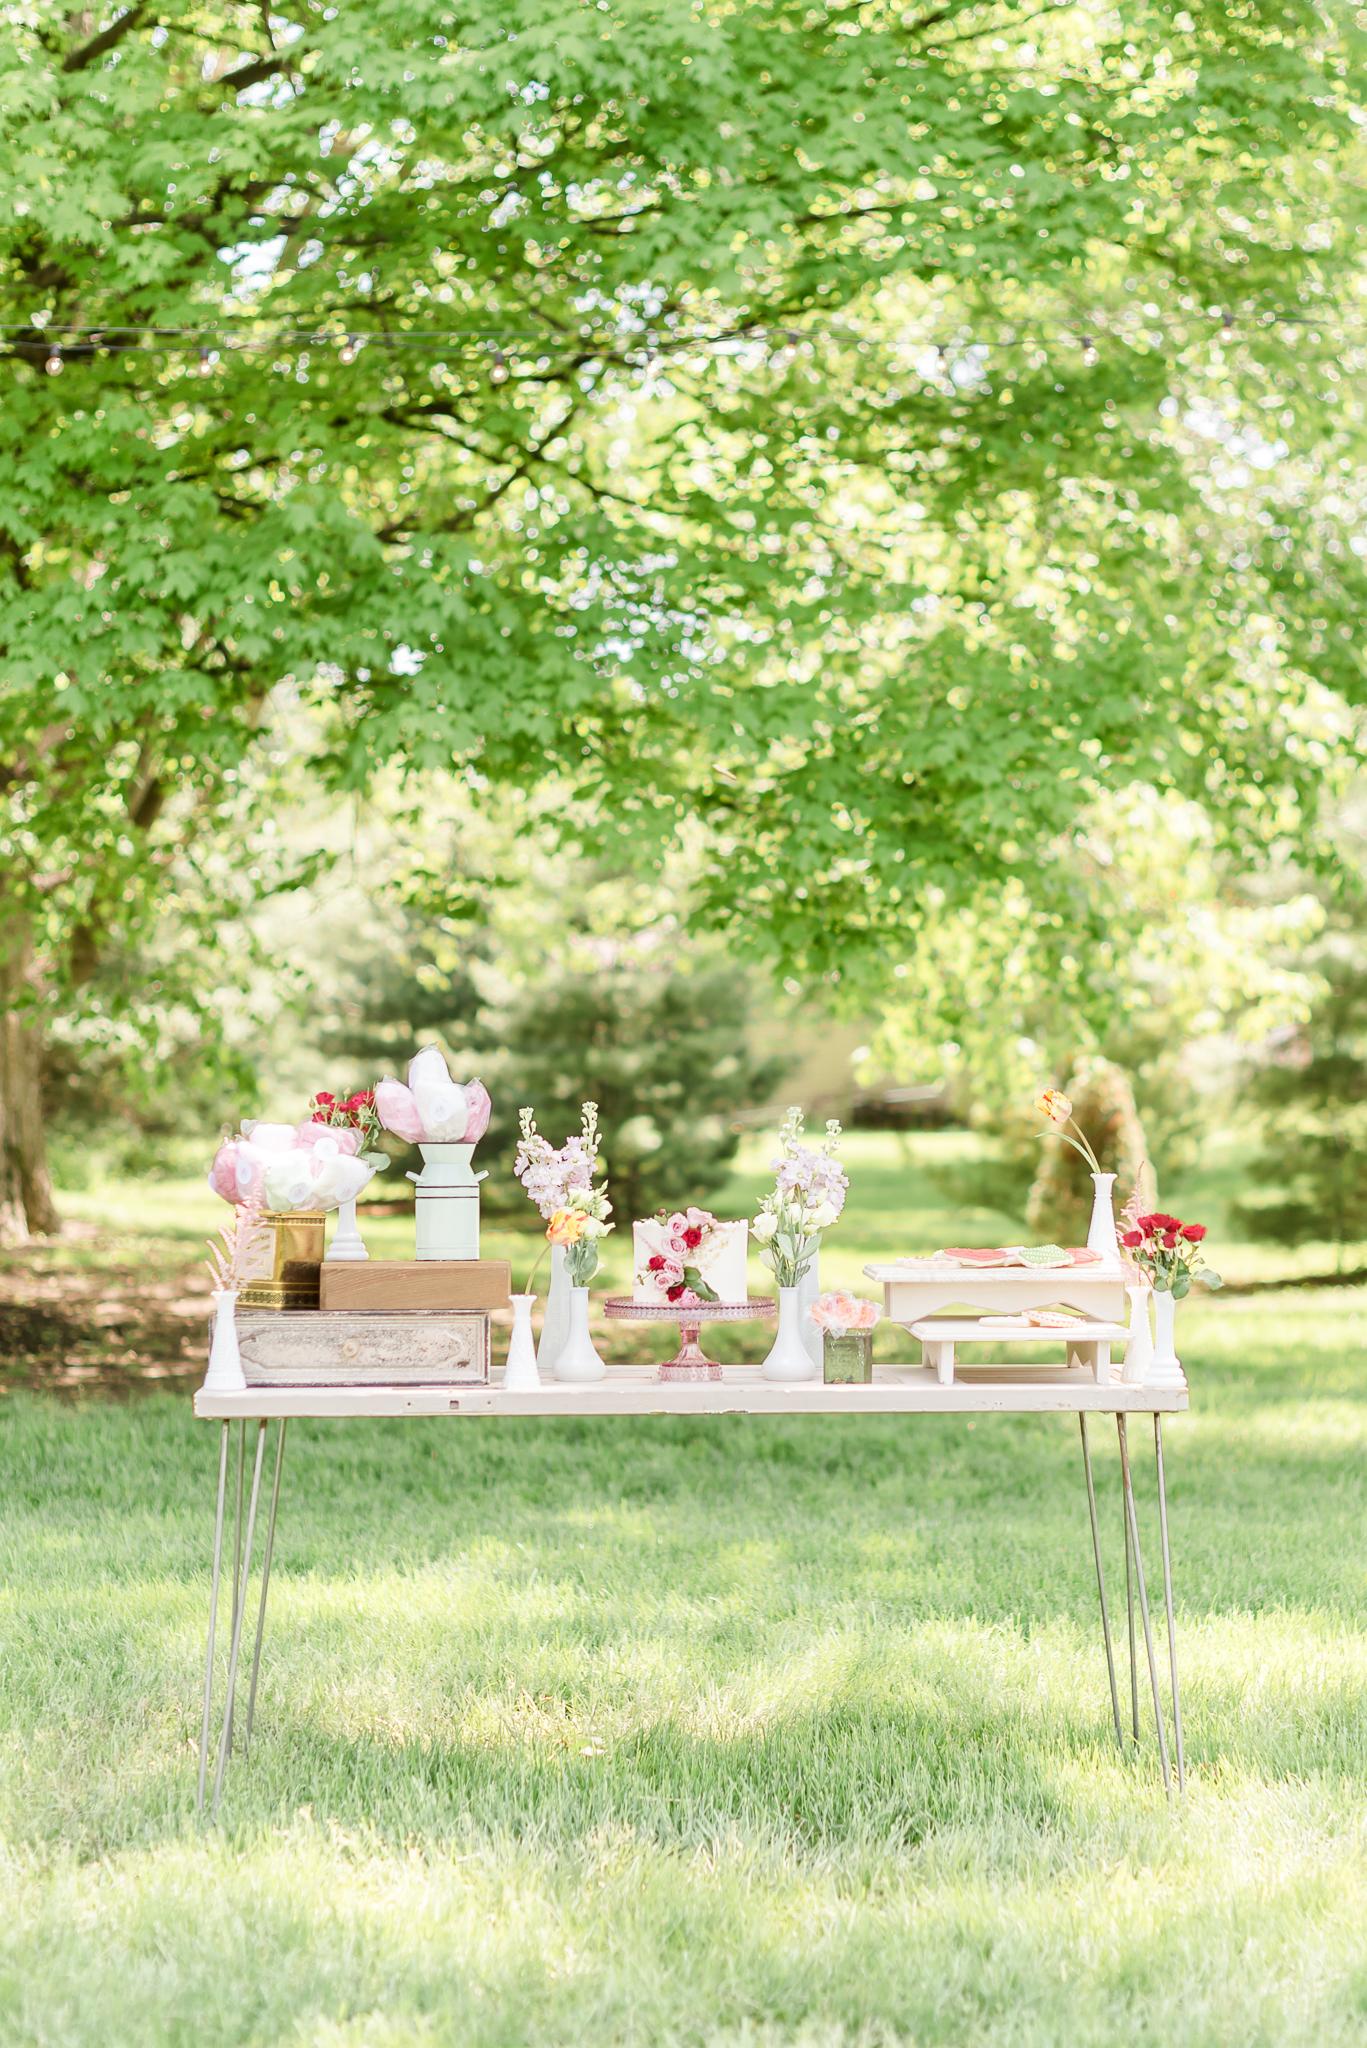 Mustard Seed Gardens Wedding Indianapolis Noblesvile Fishers Wedding Photographer-77.jpg